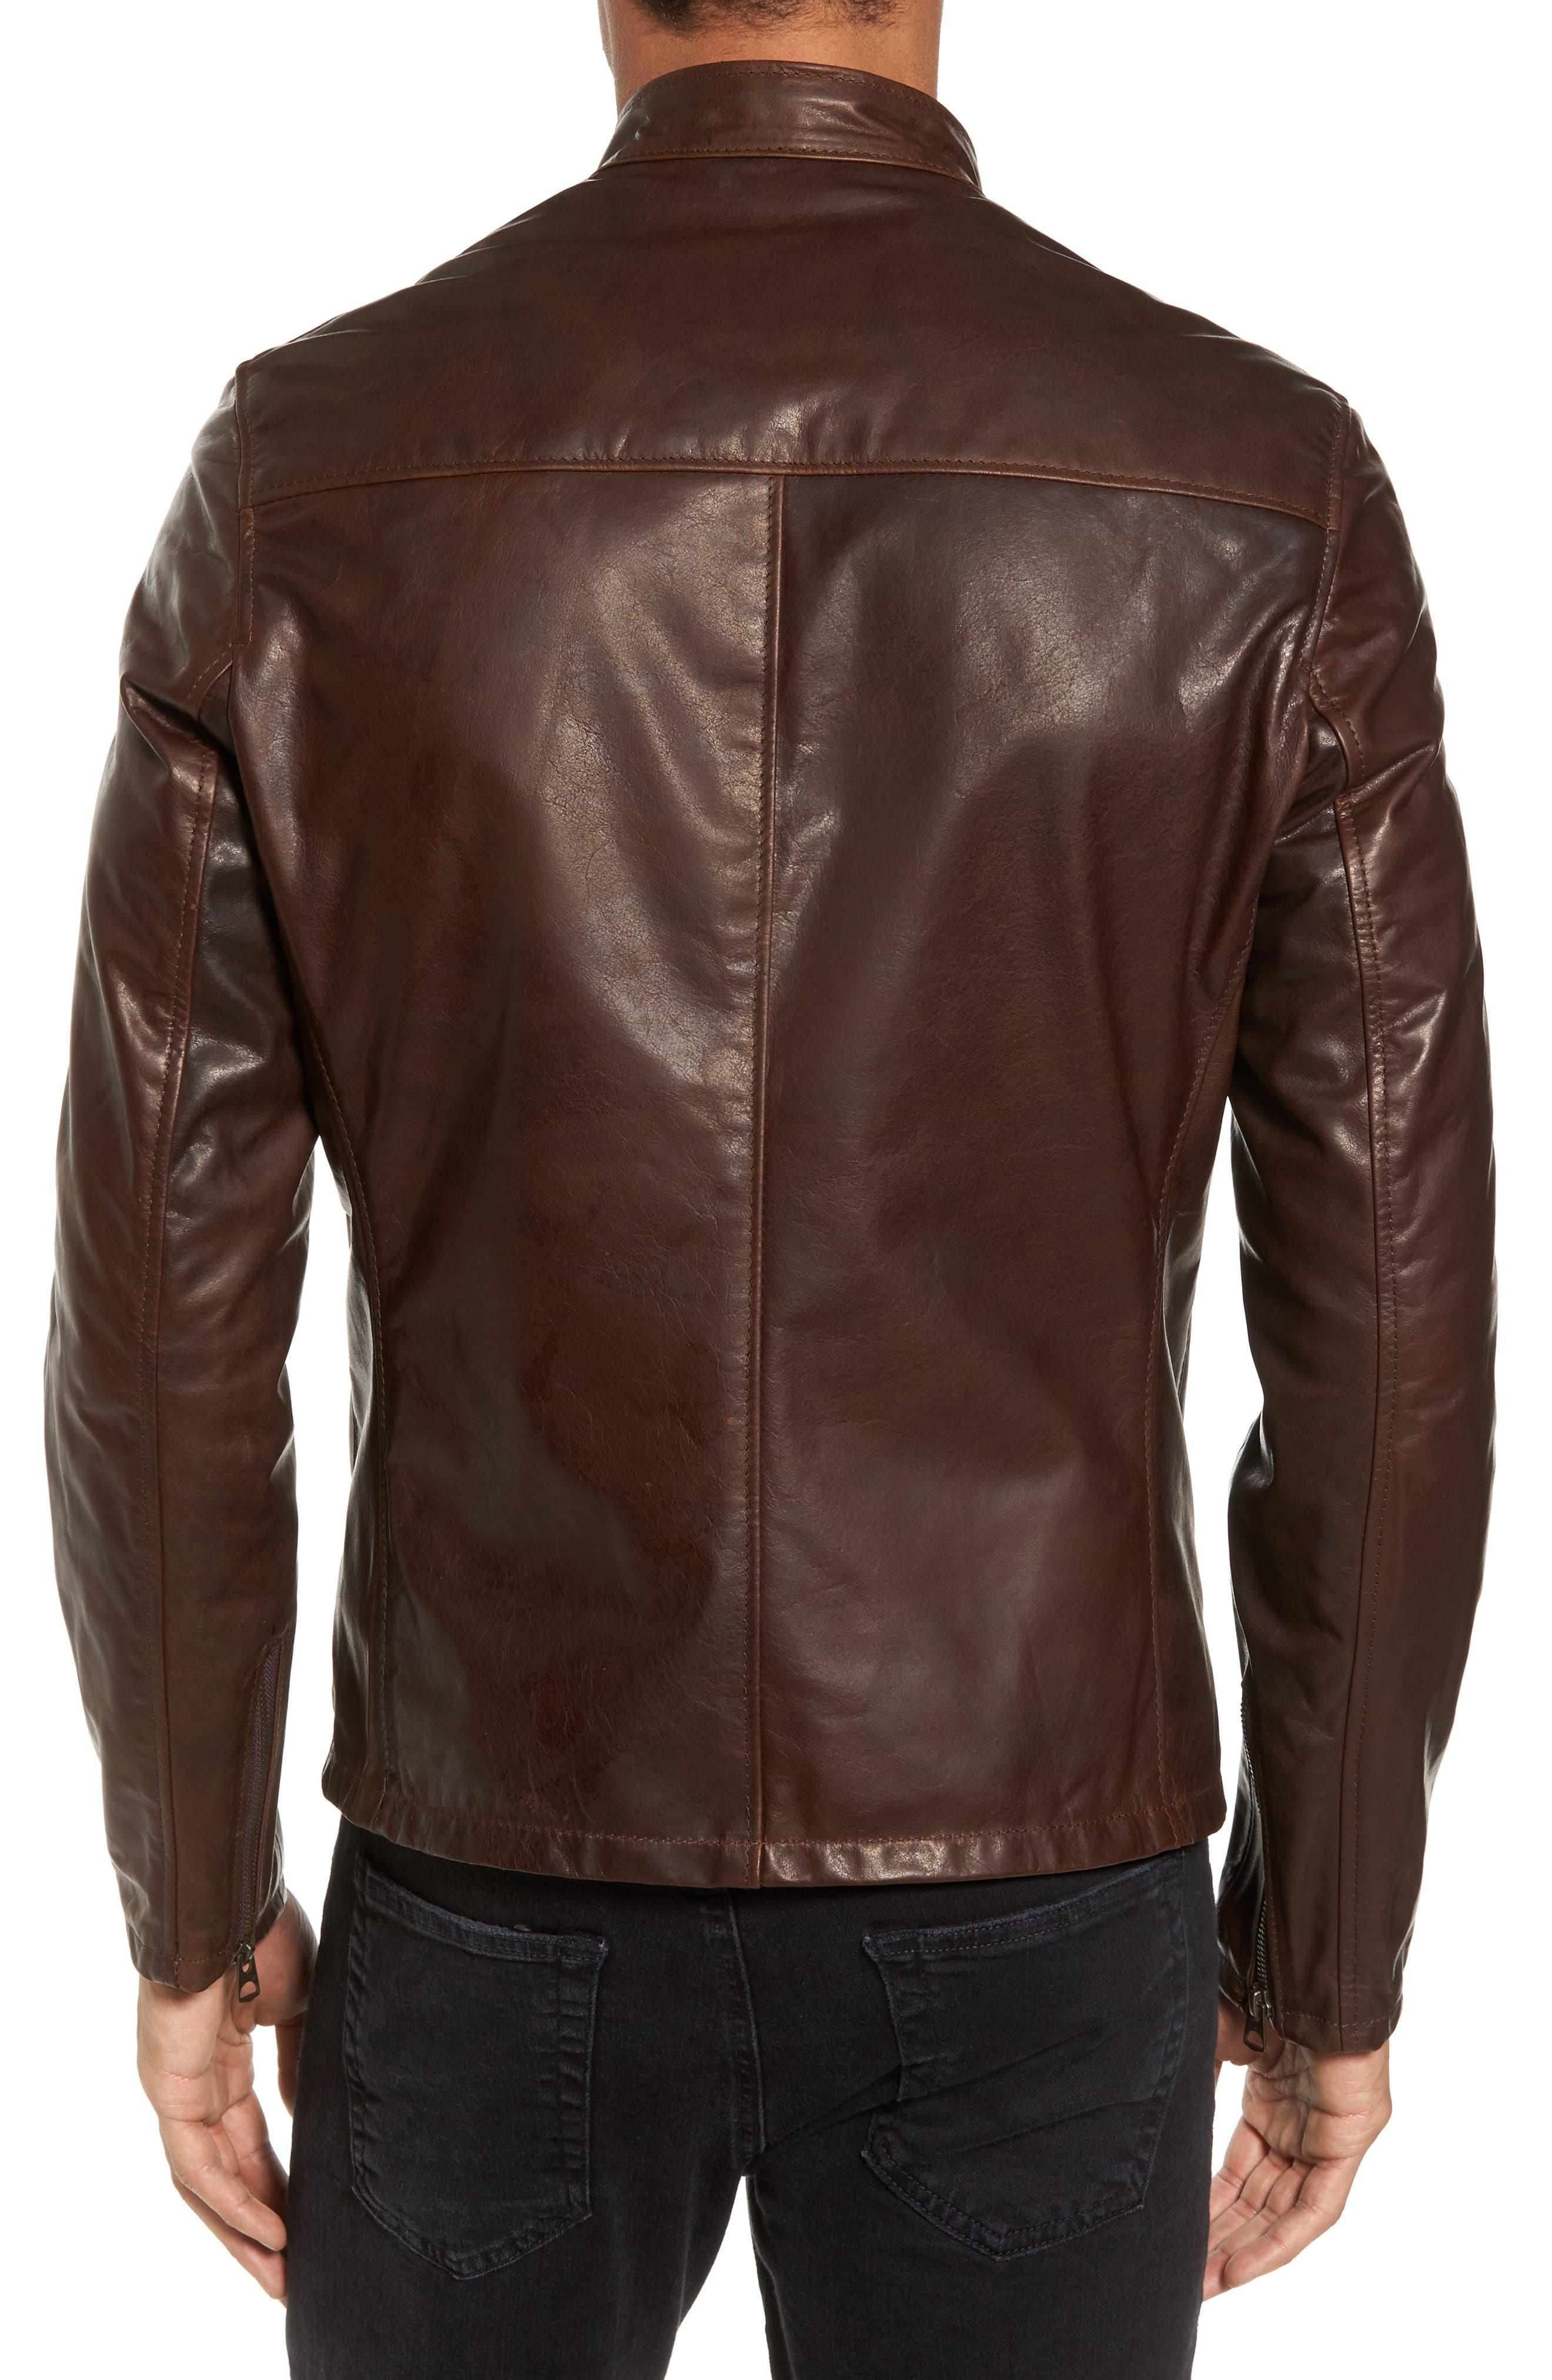 SCHOTT NYC,                             Café Racer Unlined Cowhide Leather Jacket,                             Alternate thumbnail 2, color,                             BROWN